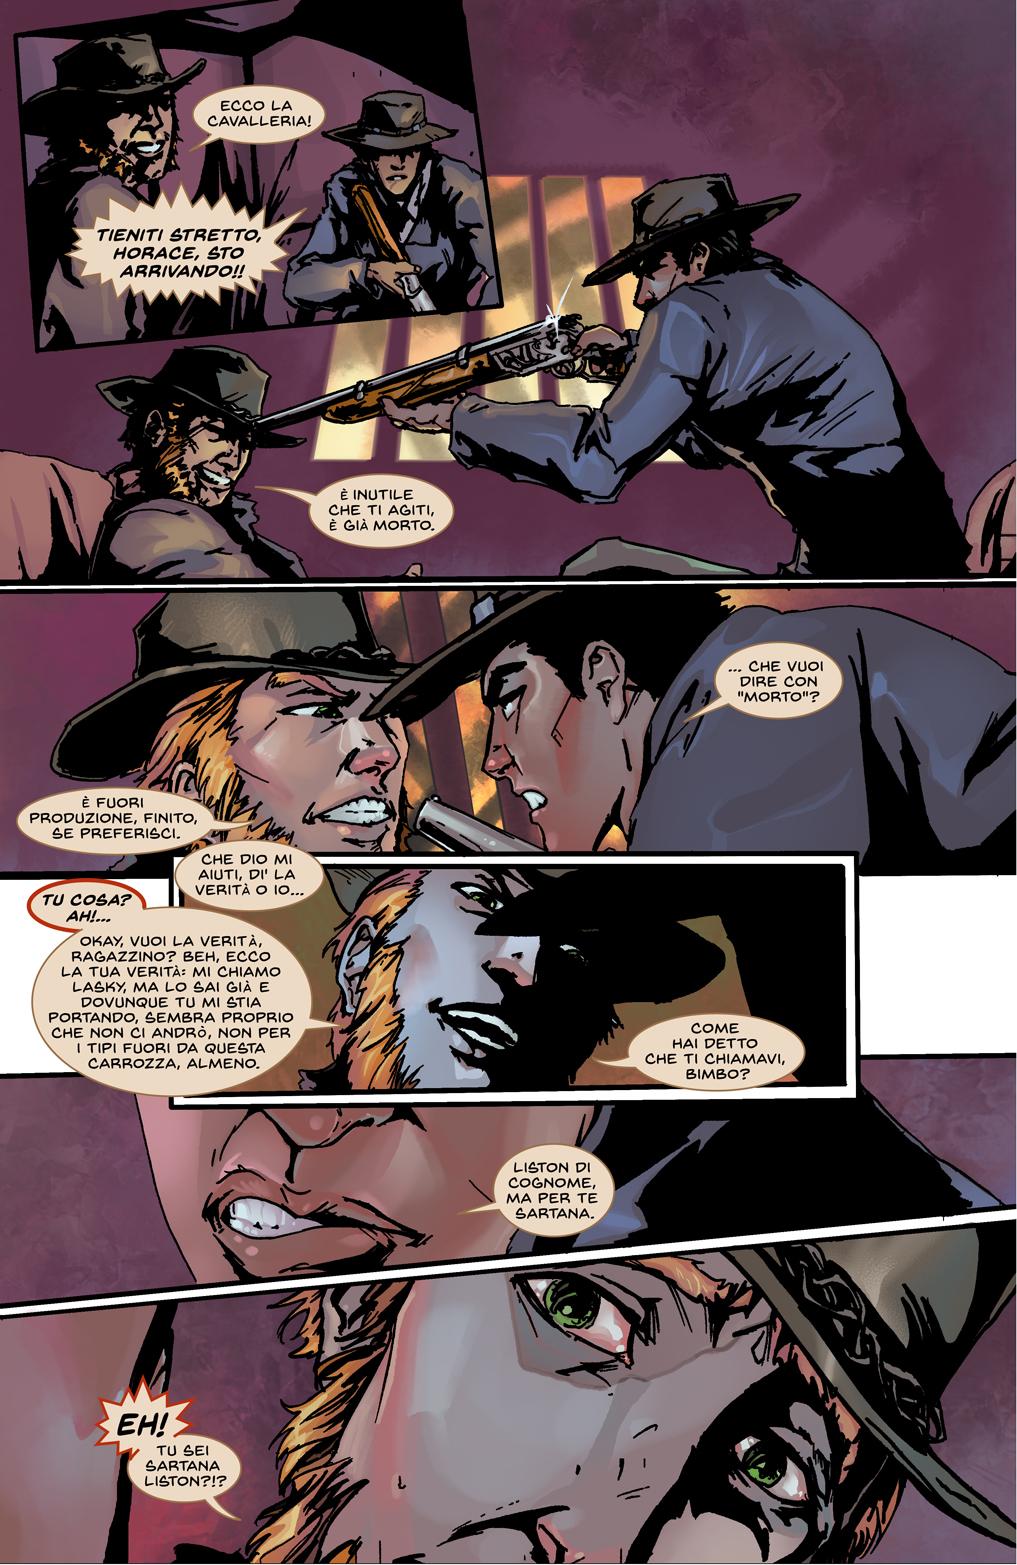 Sartana #1 - Page 3 - Italian Edition